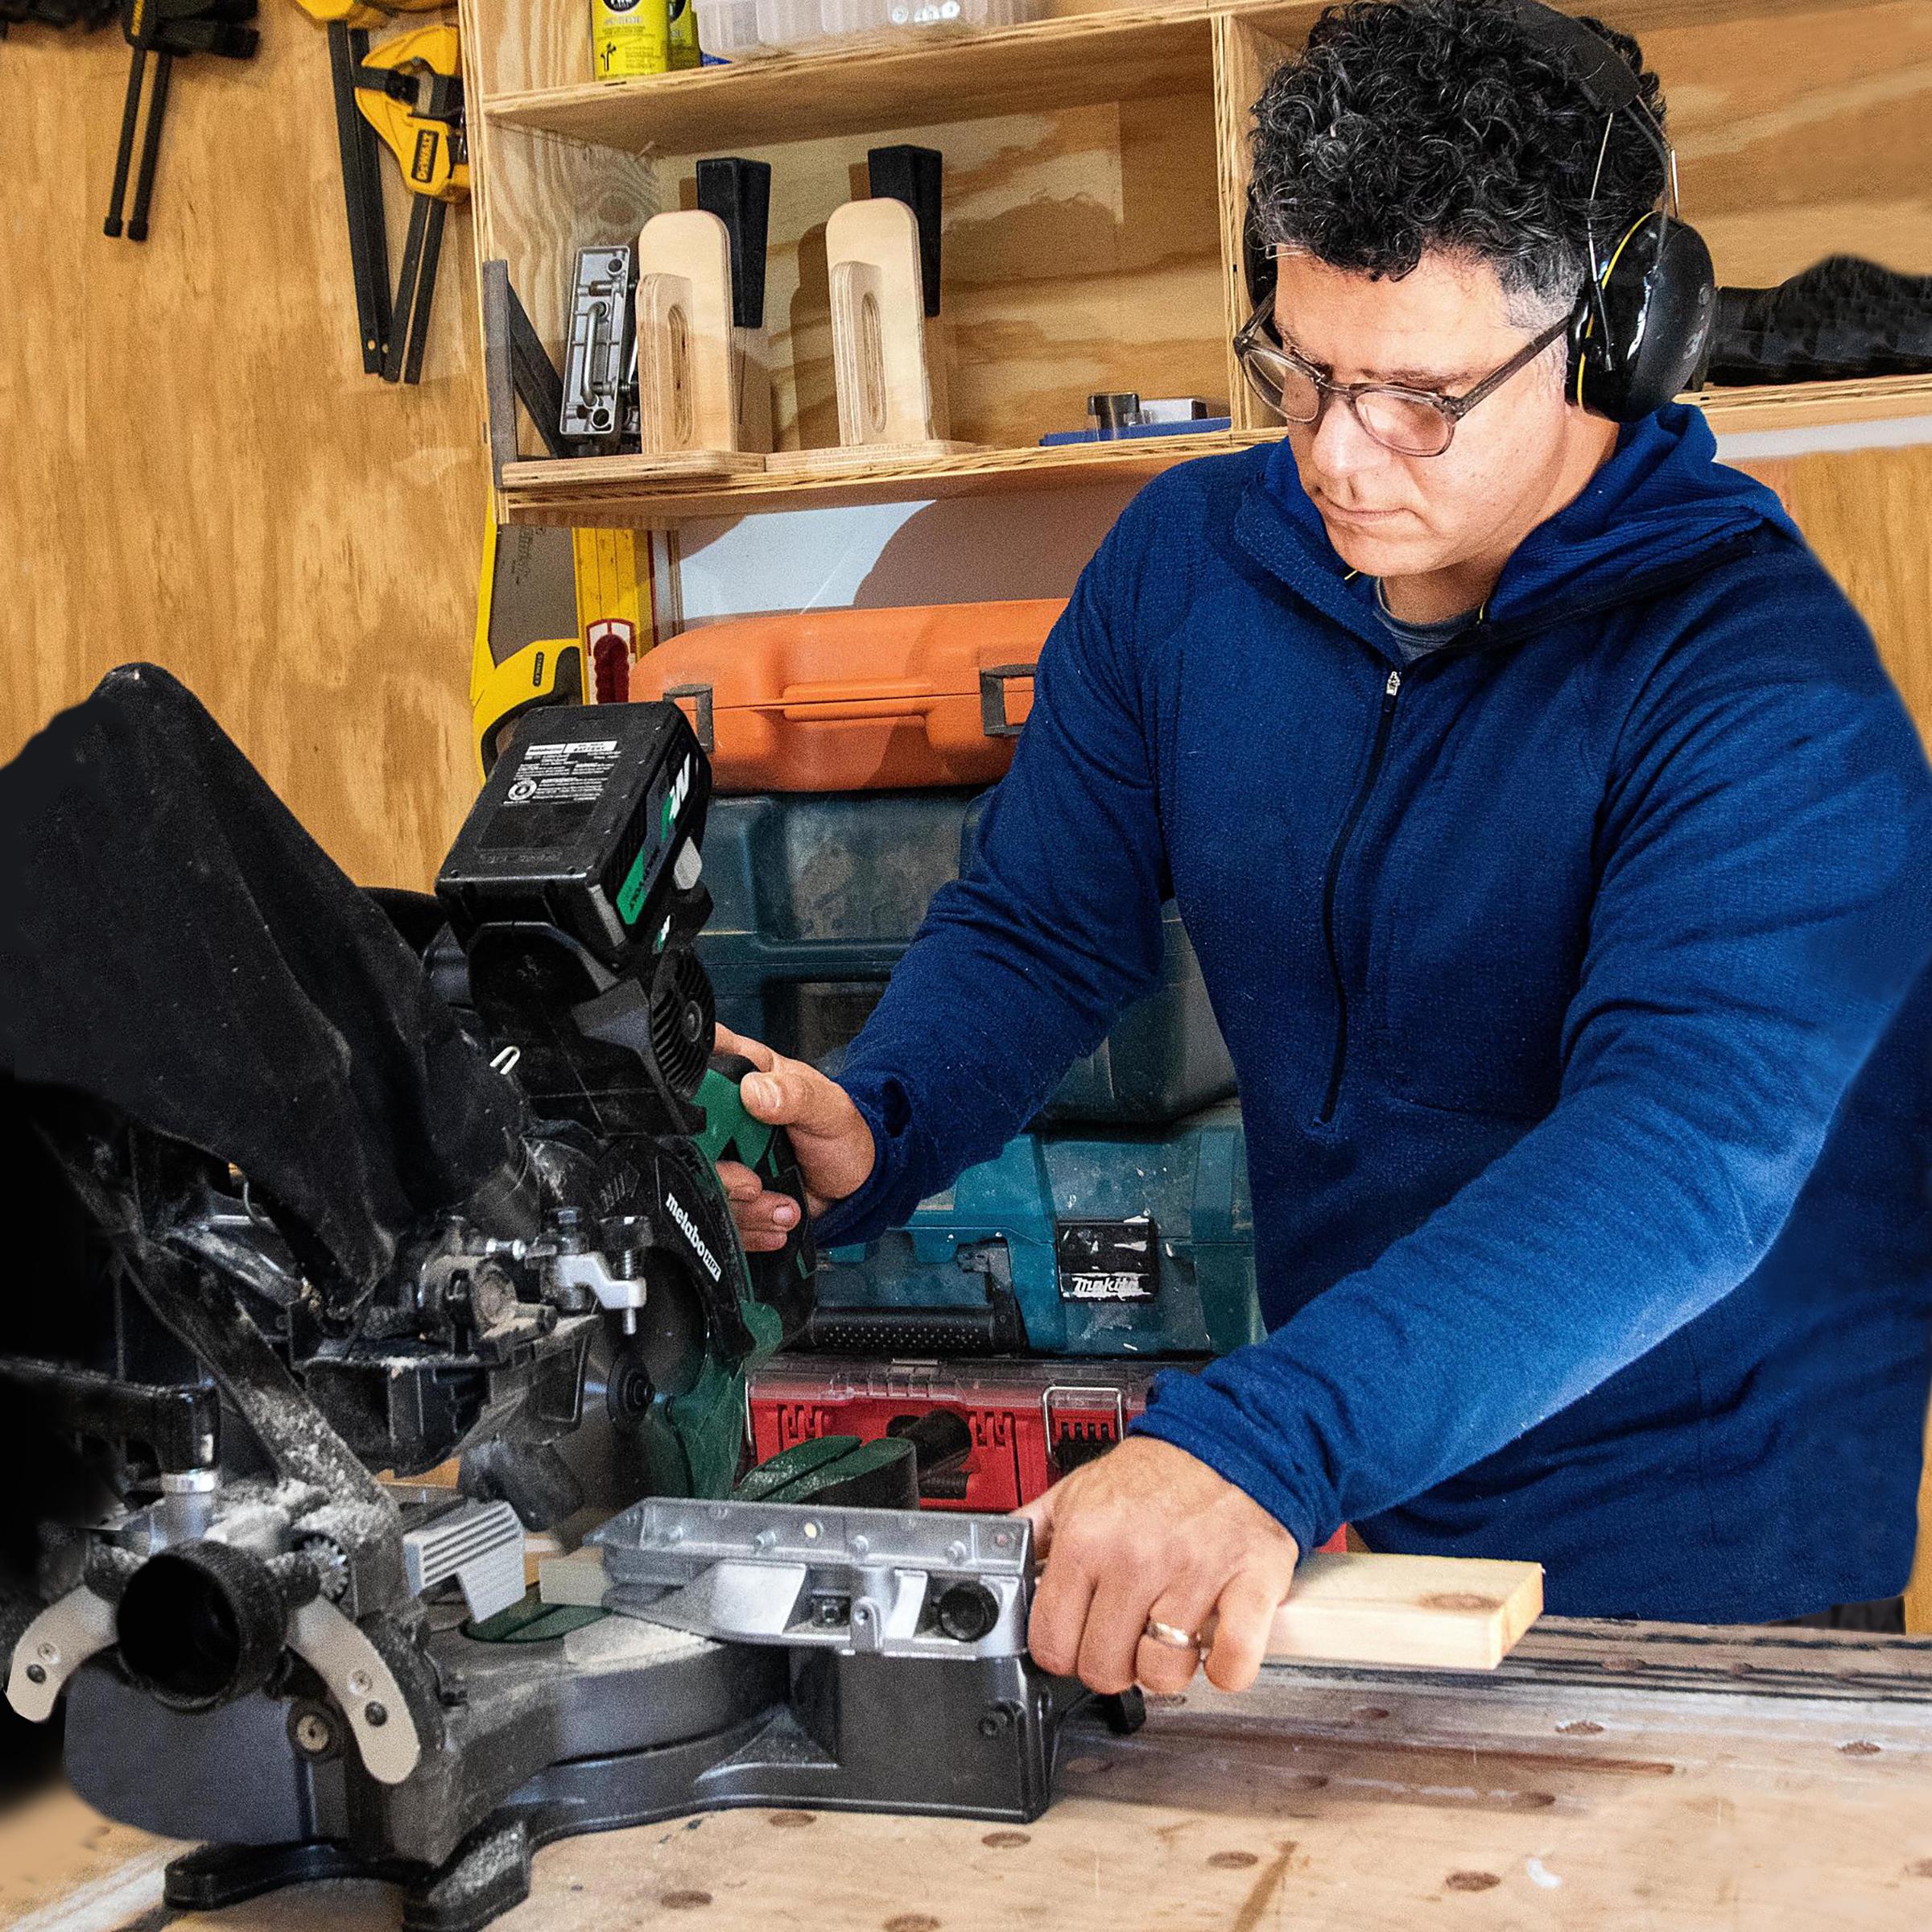 Tool Lab: Sliding Compound-Miter Saws, Spring 2021, Chris Ermides testing a miter saw